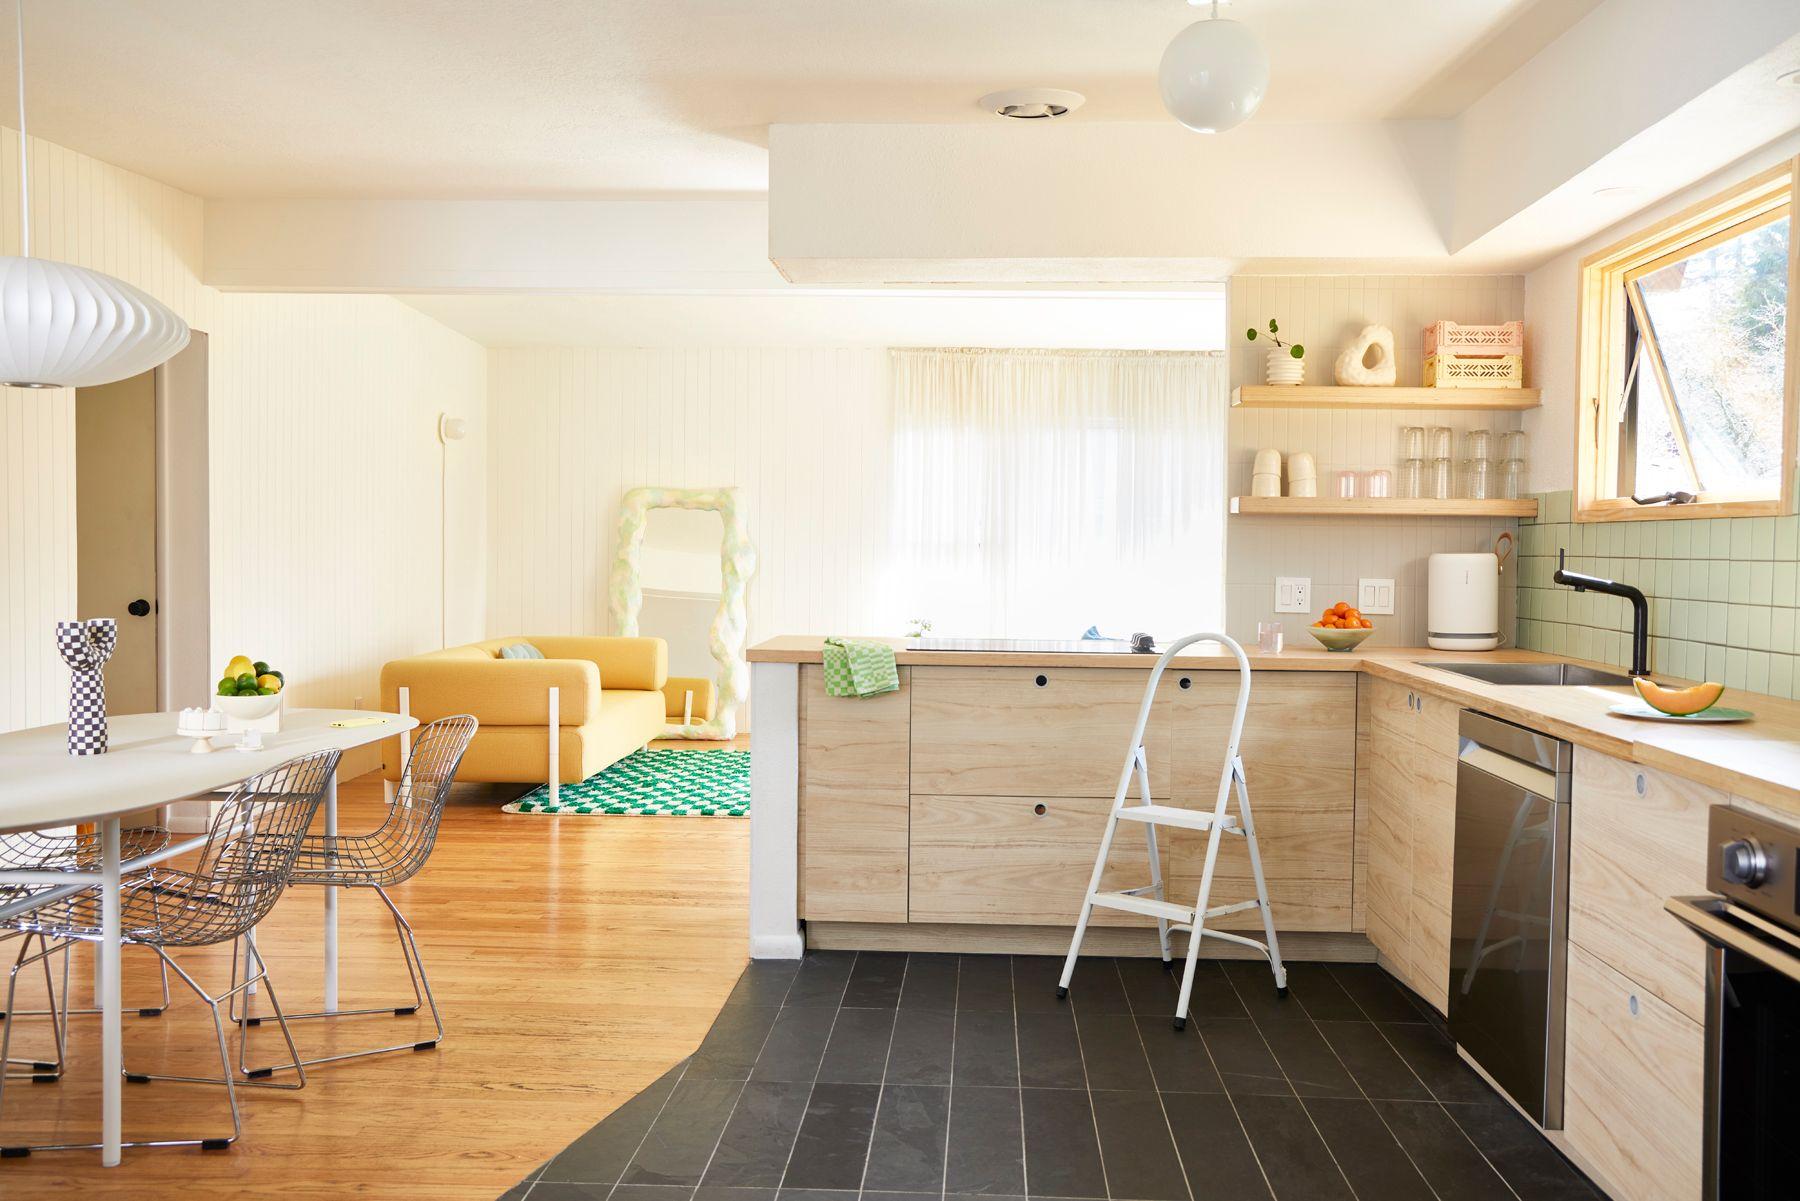 george_barberis_kitchen_domino.jpg